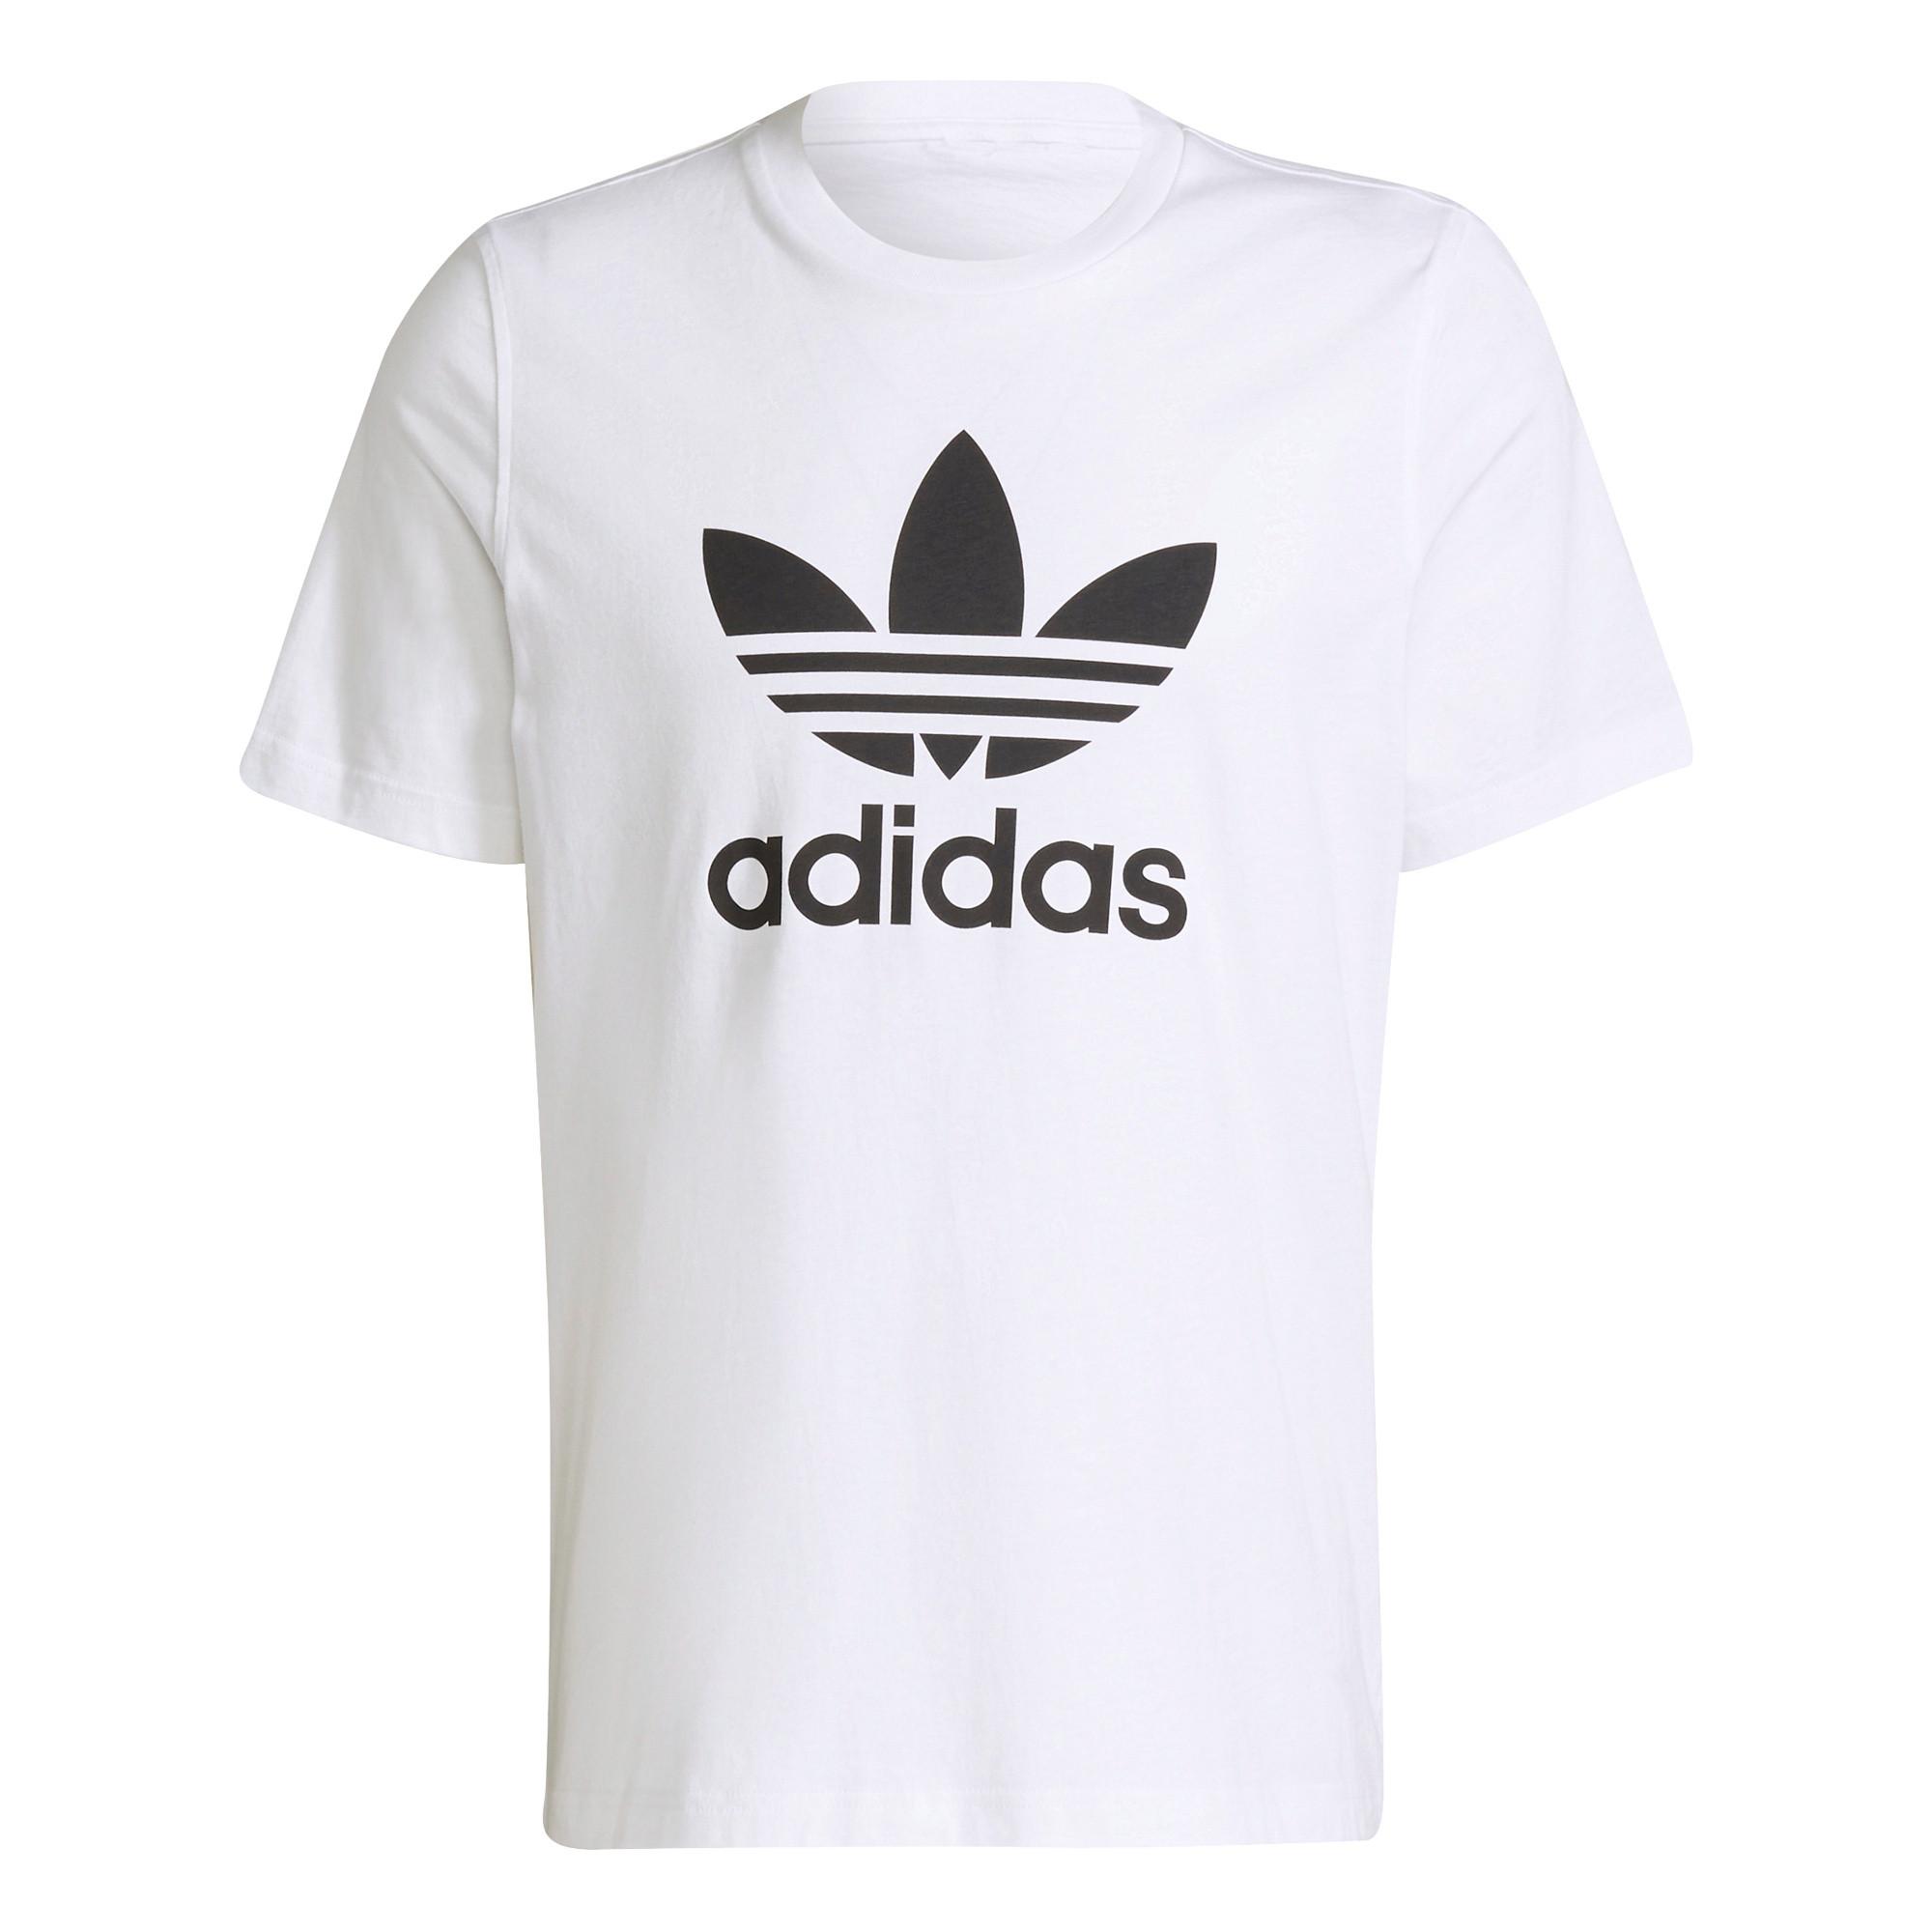 T-shirt uomo adicolor Classics Trefoil, Bianco/Nero, large image number 0